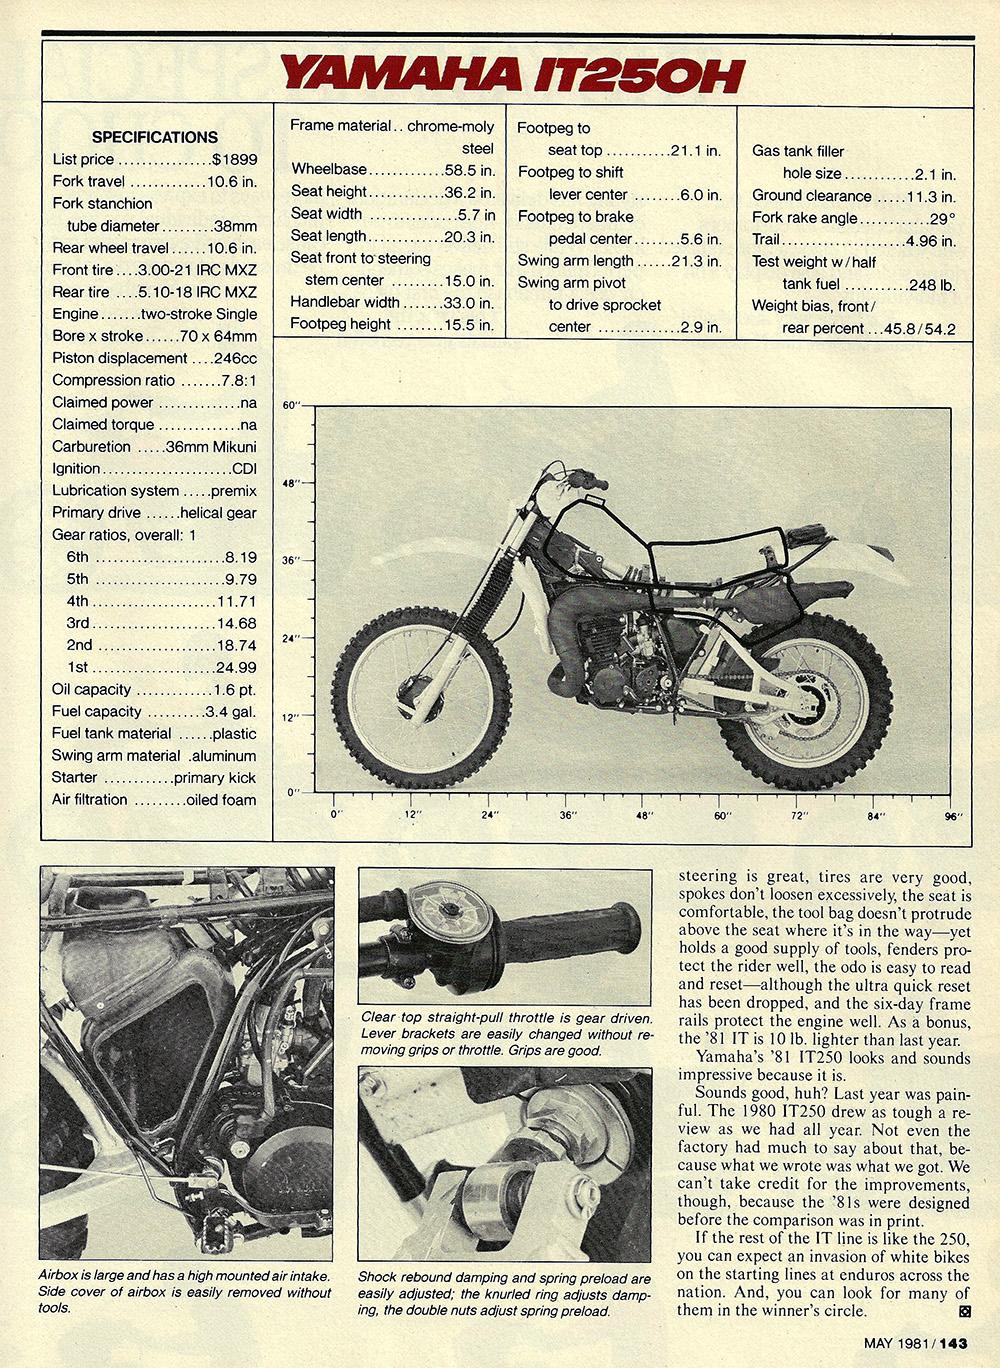 1981 Yamaha IT250H road test 06.jpg